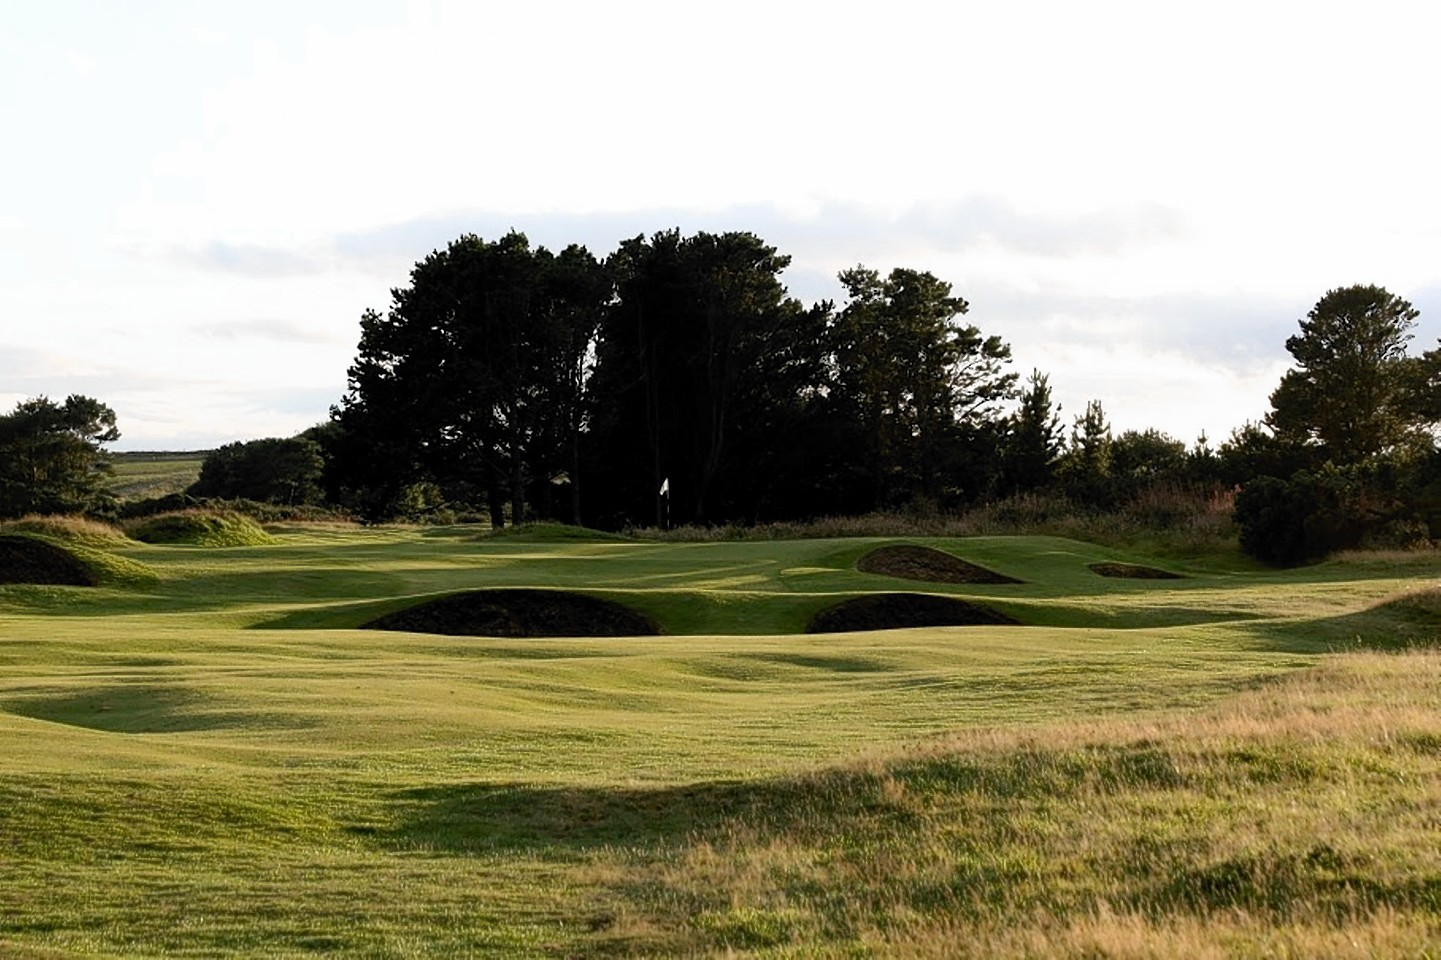 The fairways of Nairn Golf Course